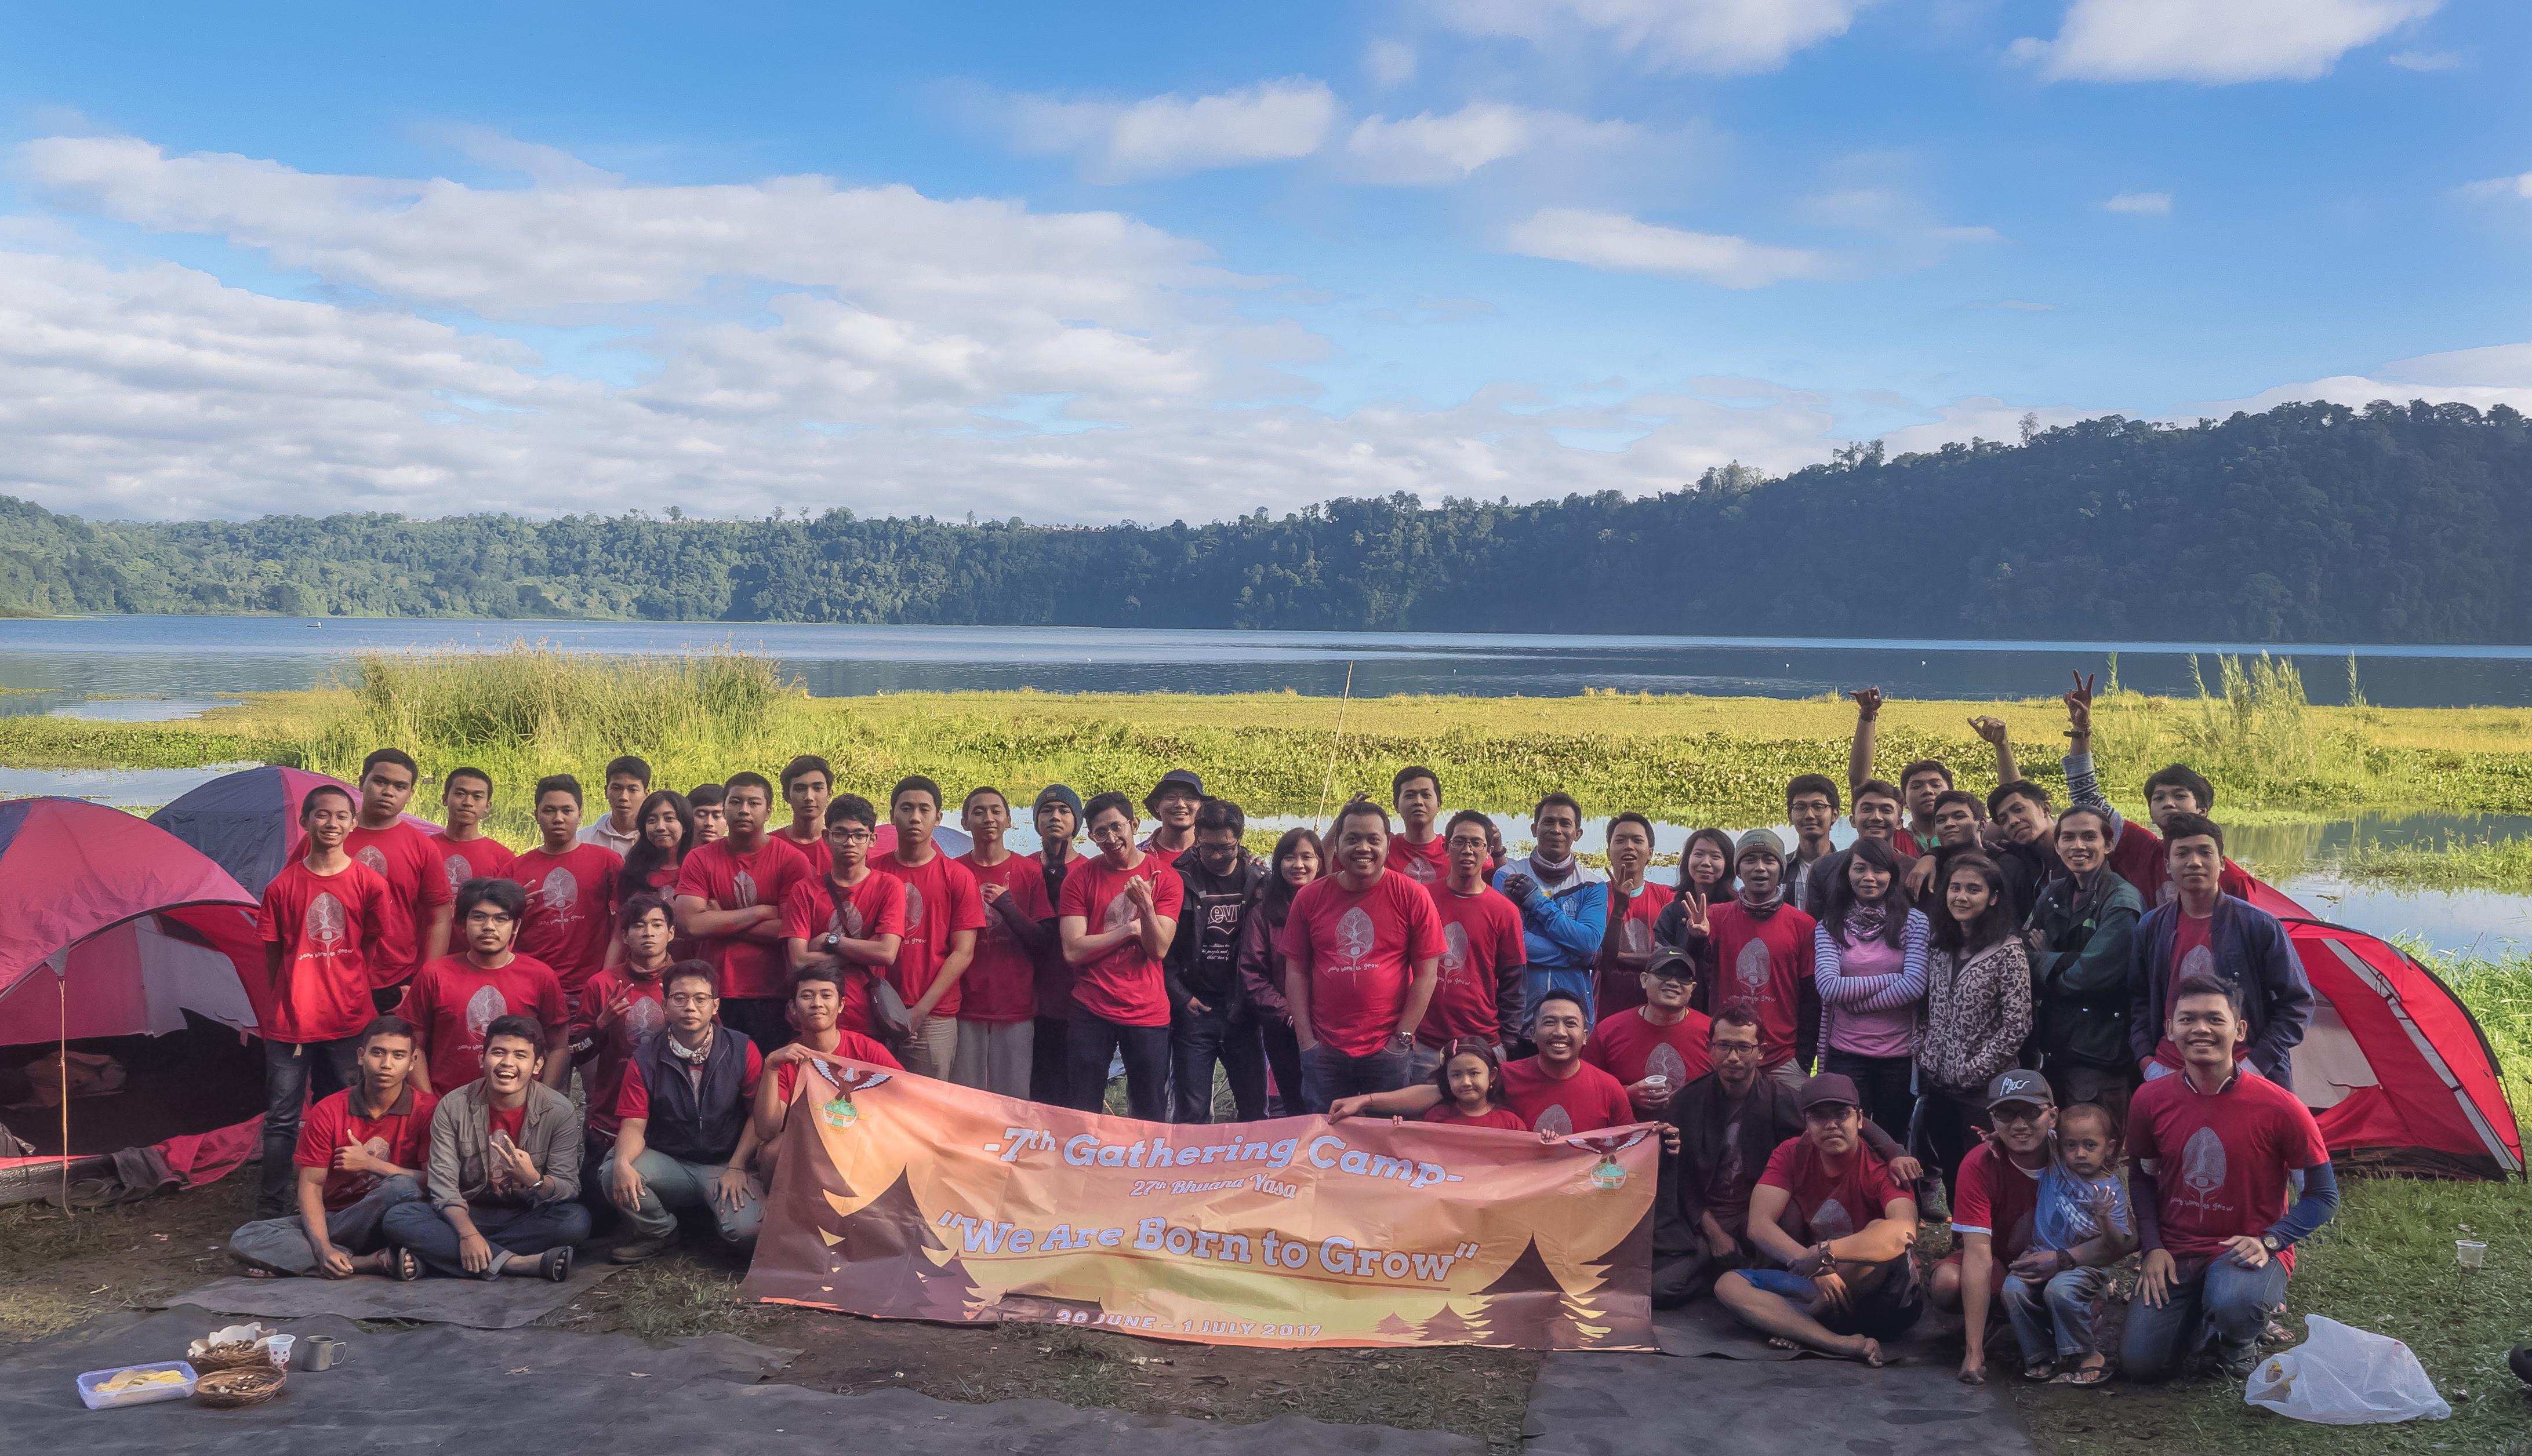 Gathering Camp Sispala Bhuana Yasa Pertama tahun 2017 di Buyan